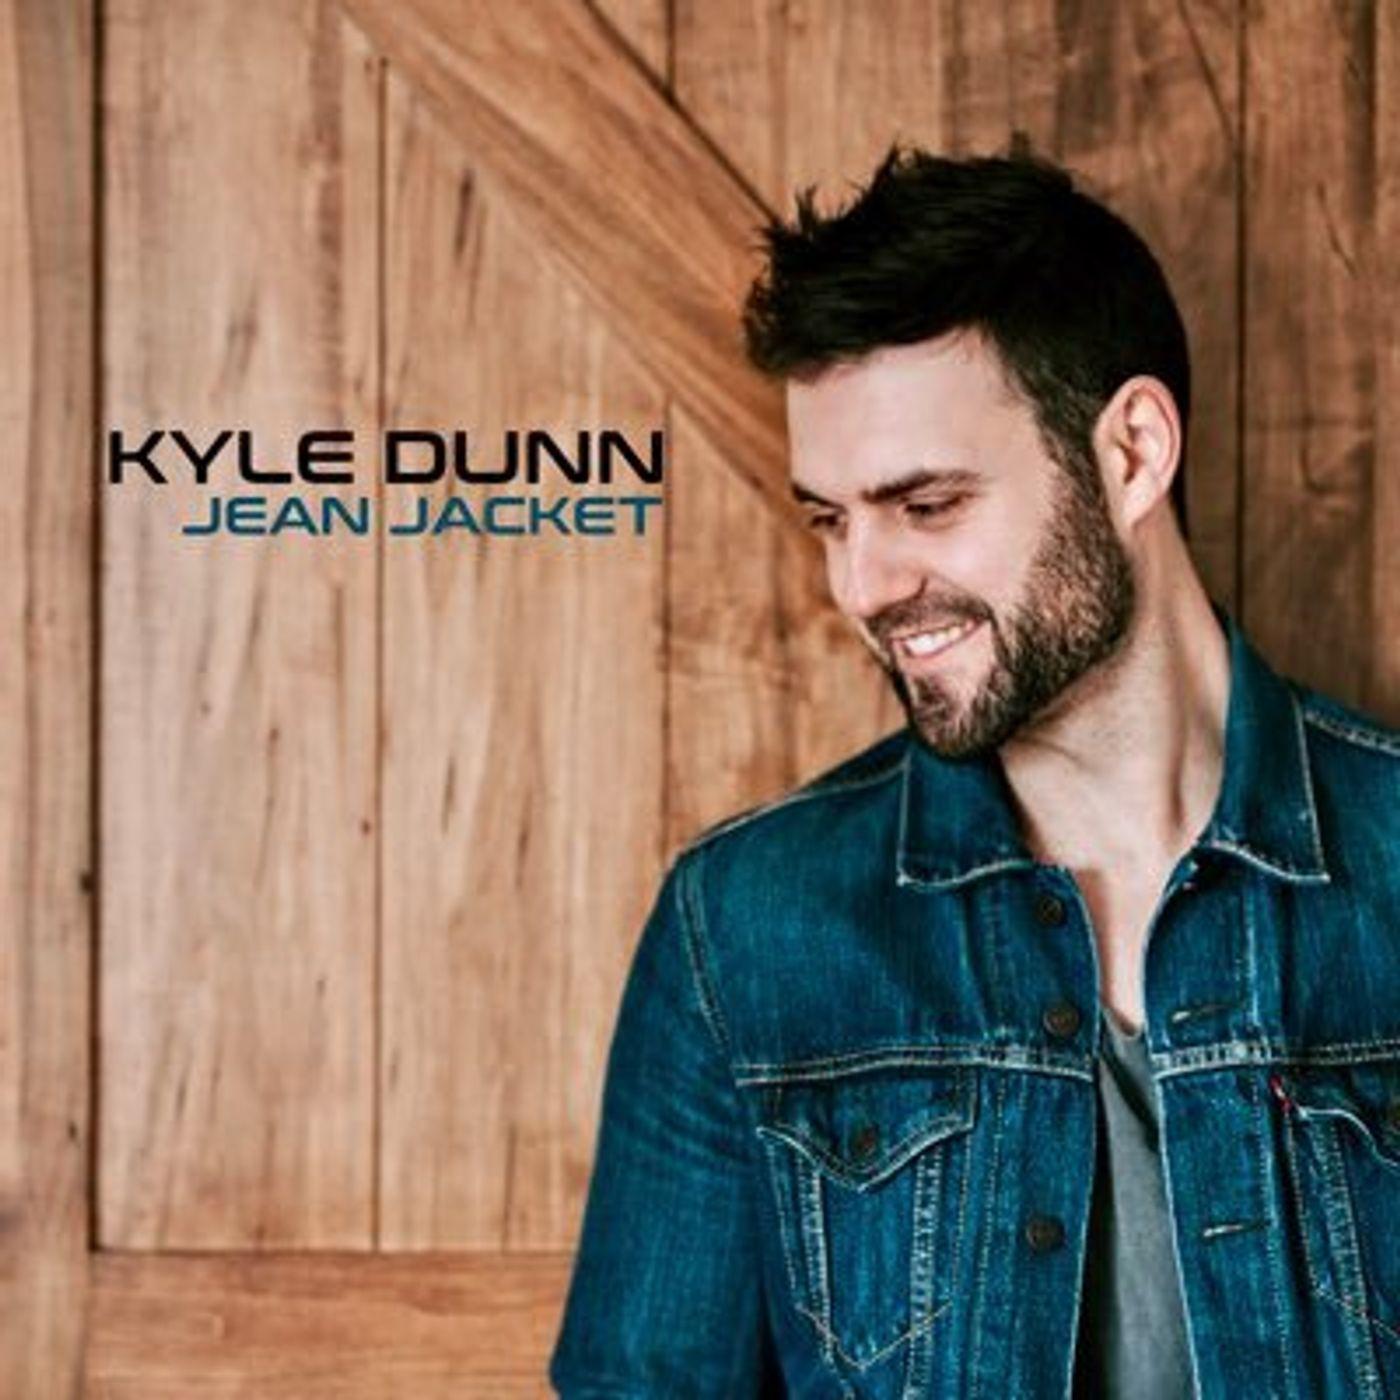 Kyle Dunn Music